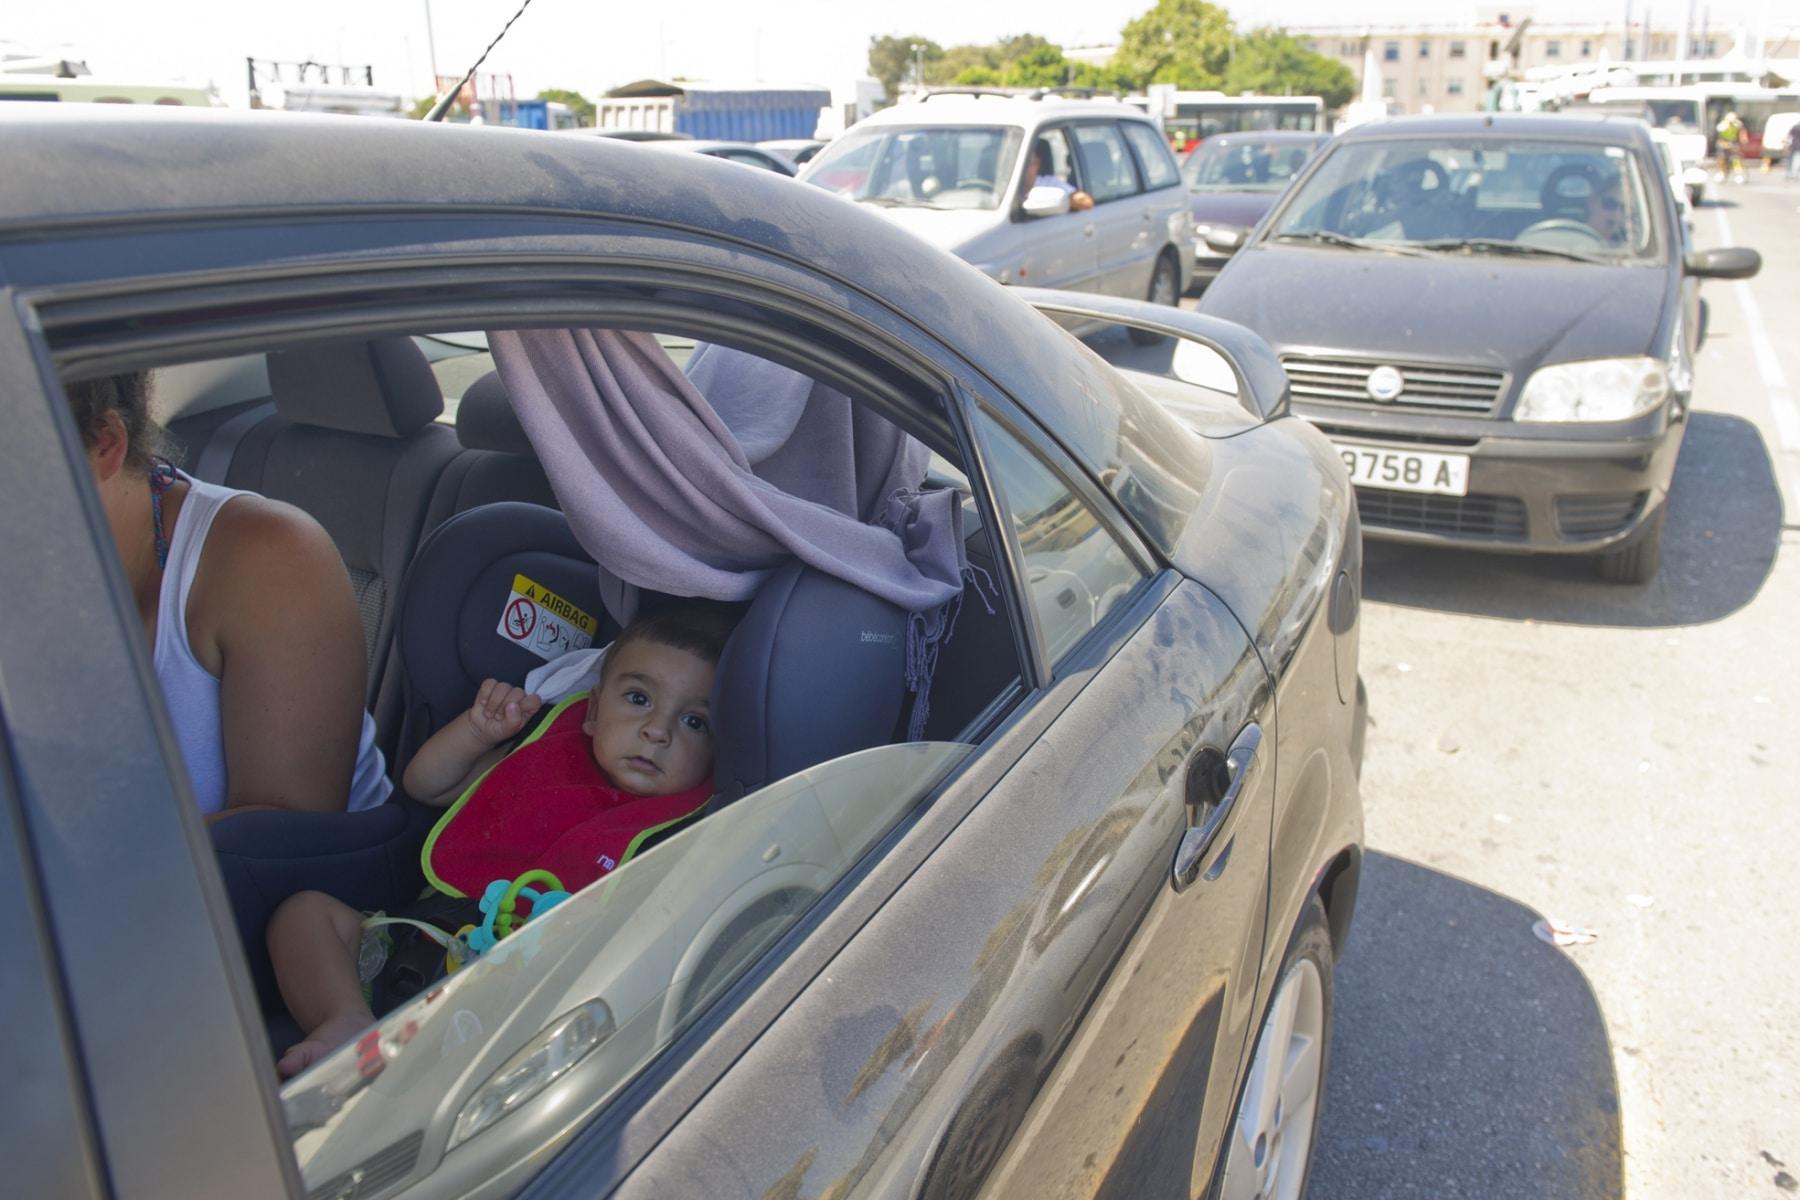 21-agosto-2014-colas-de-entrada-y-salida-de-gibraltar31_14803042770_o